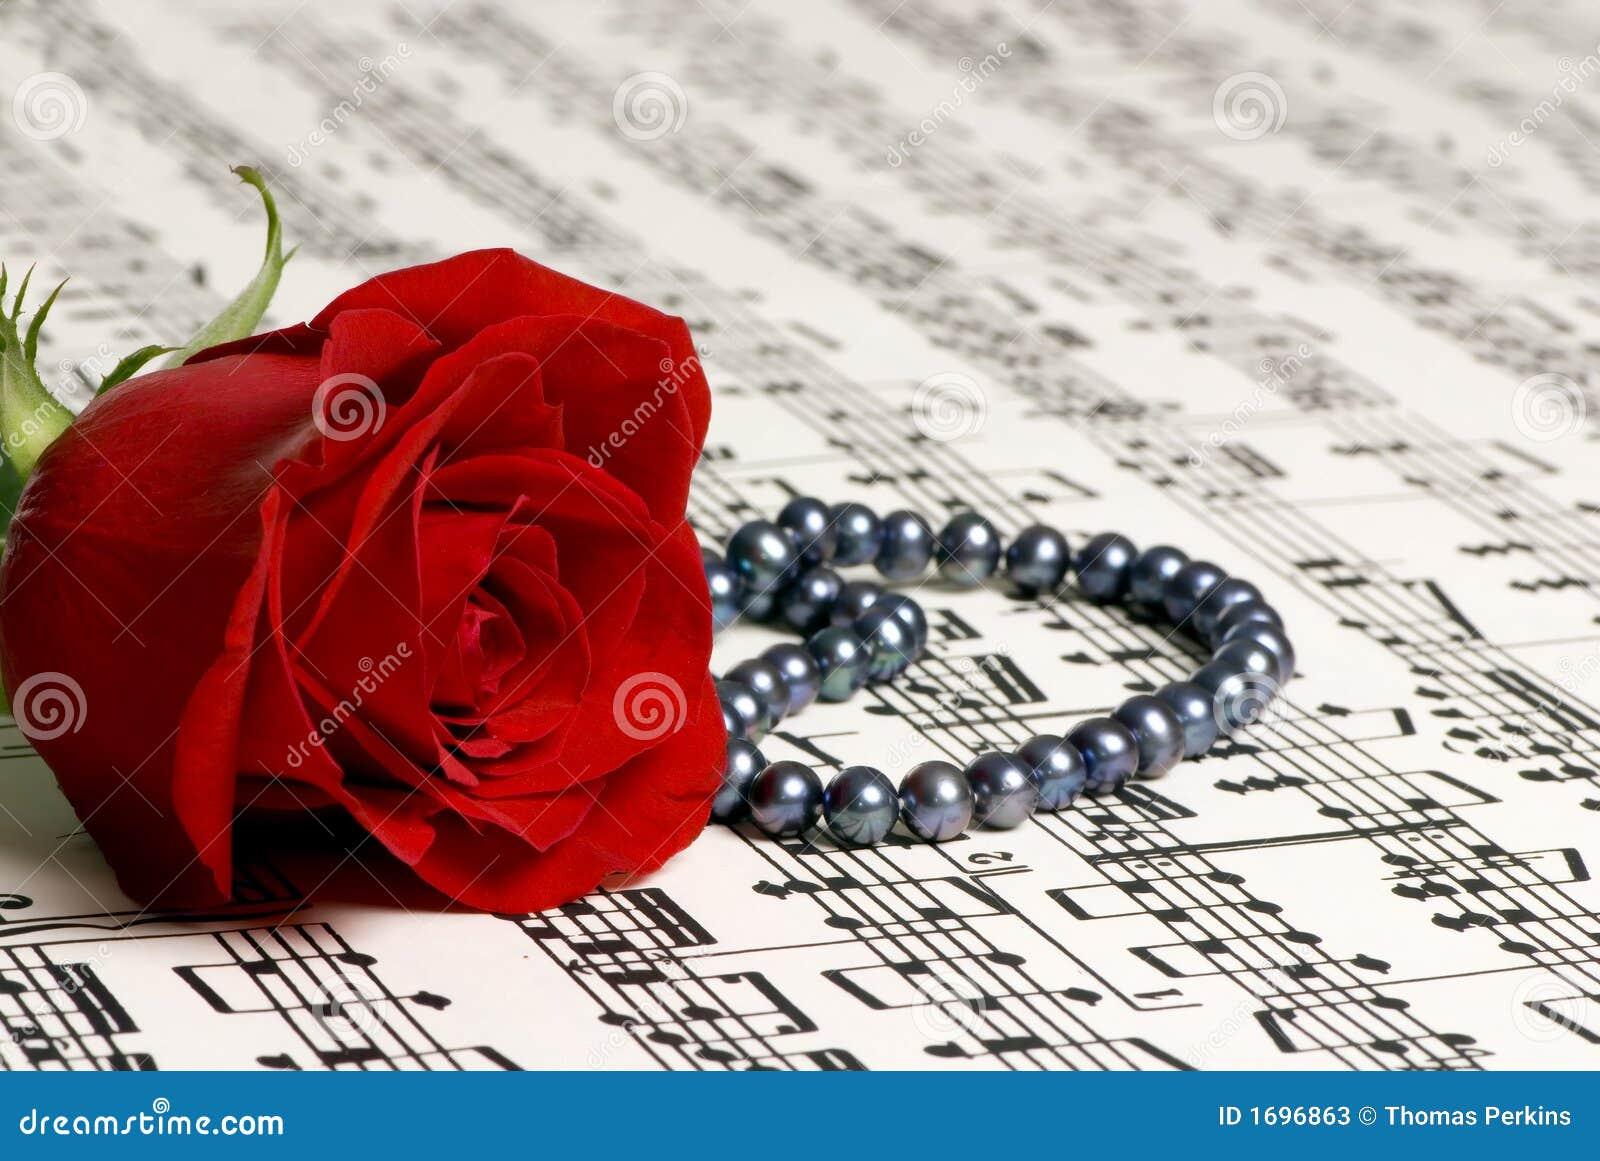 Muzyka 4 rose